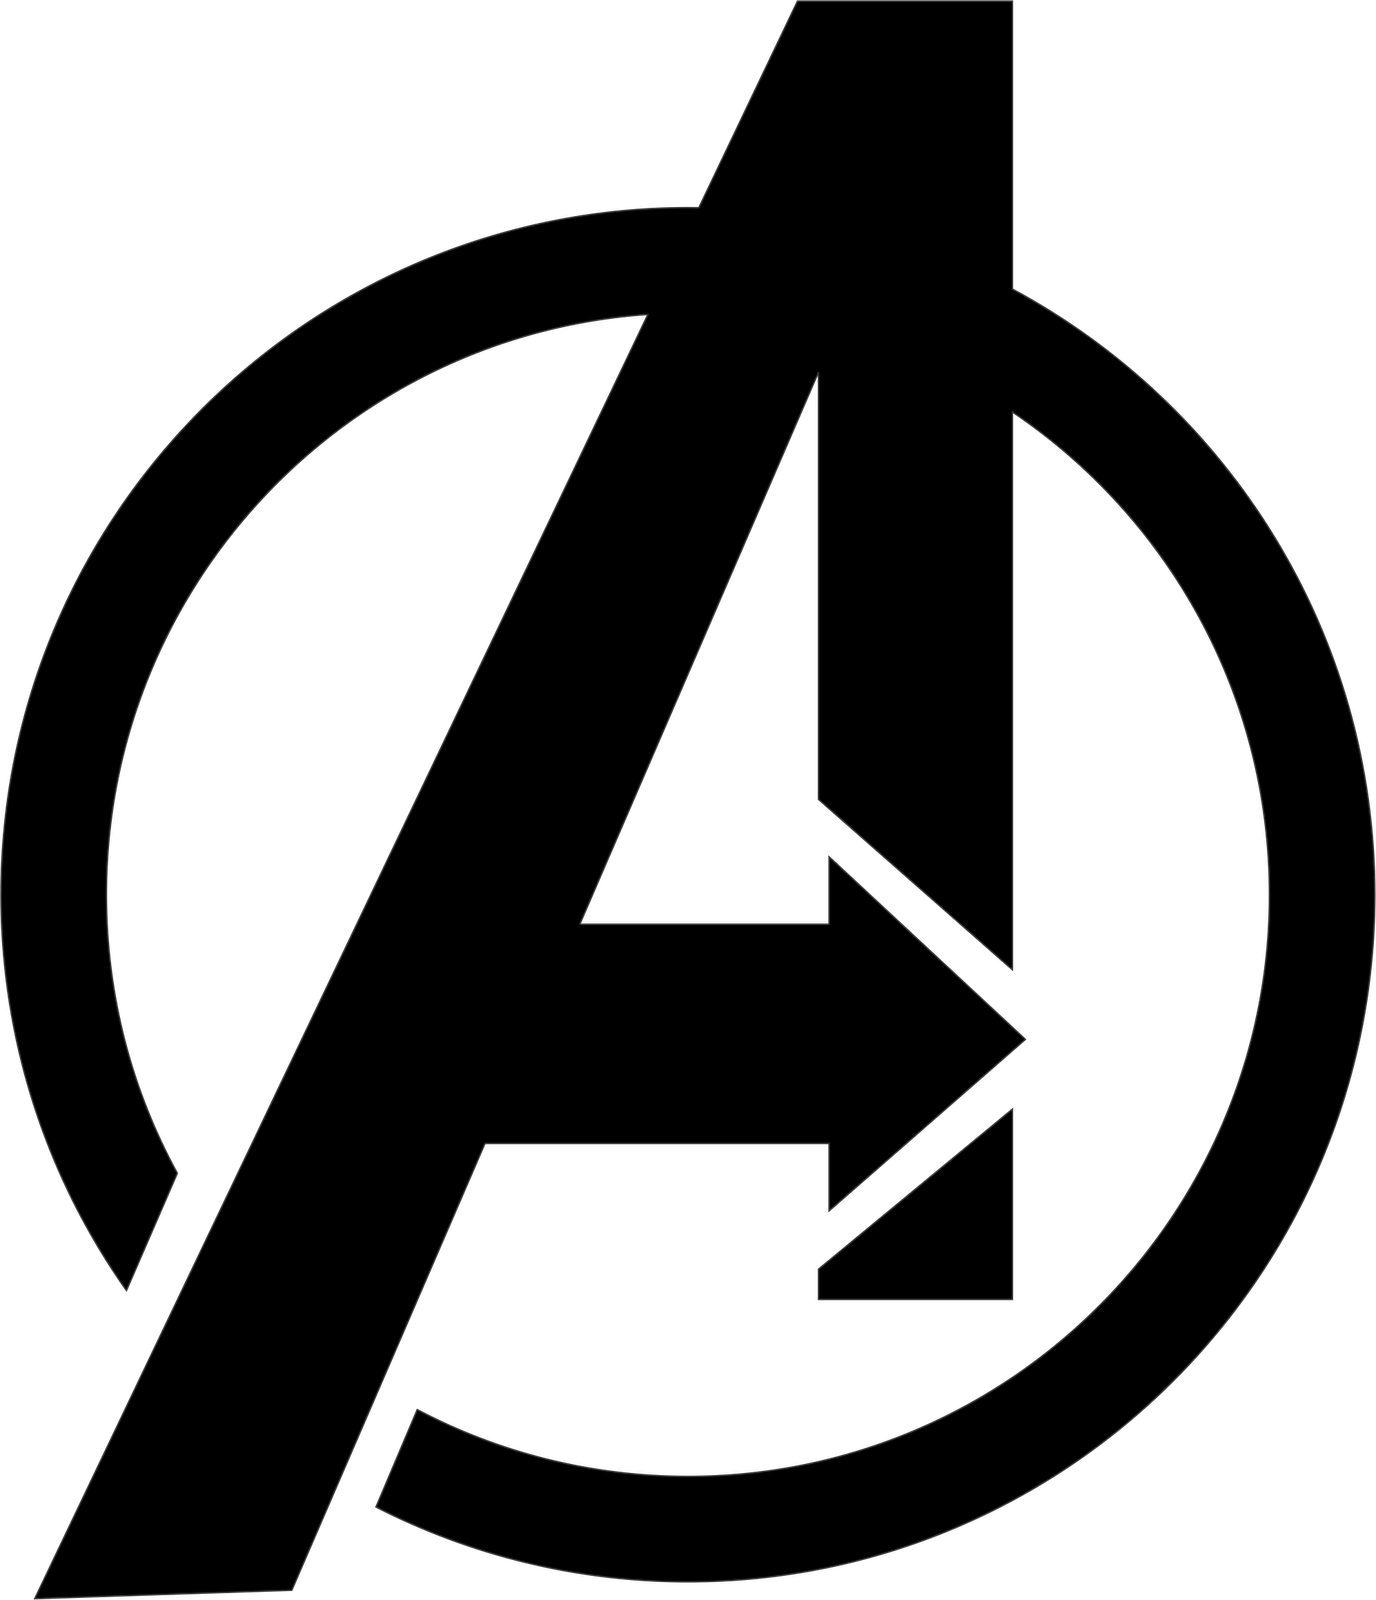 Denizignko's Freebies - The Avengers Logo Vector Free ...